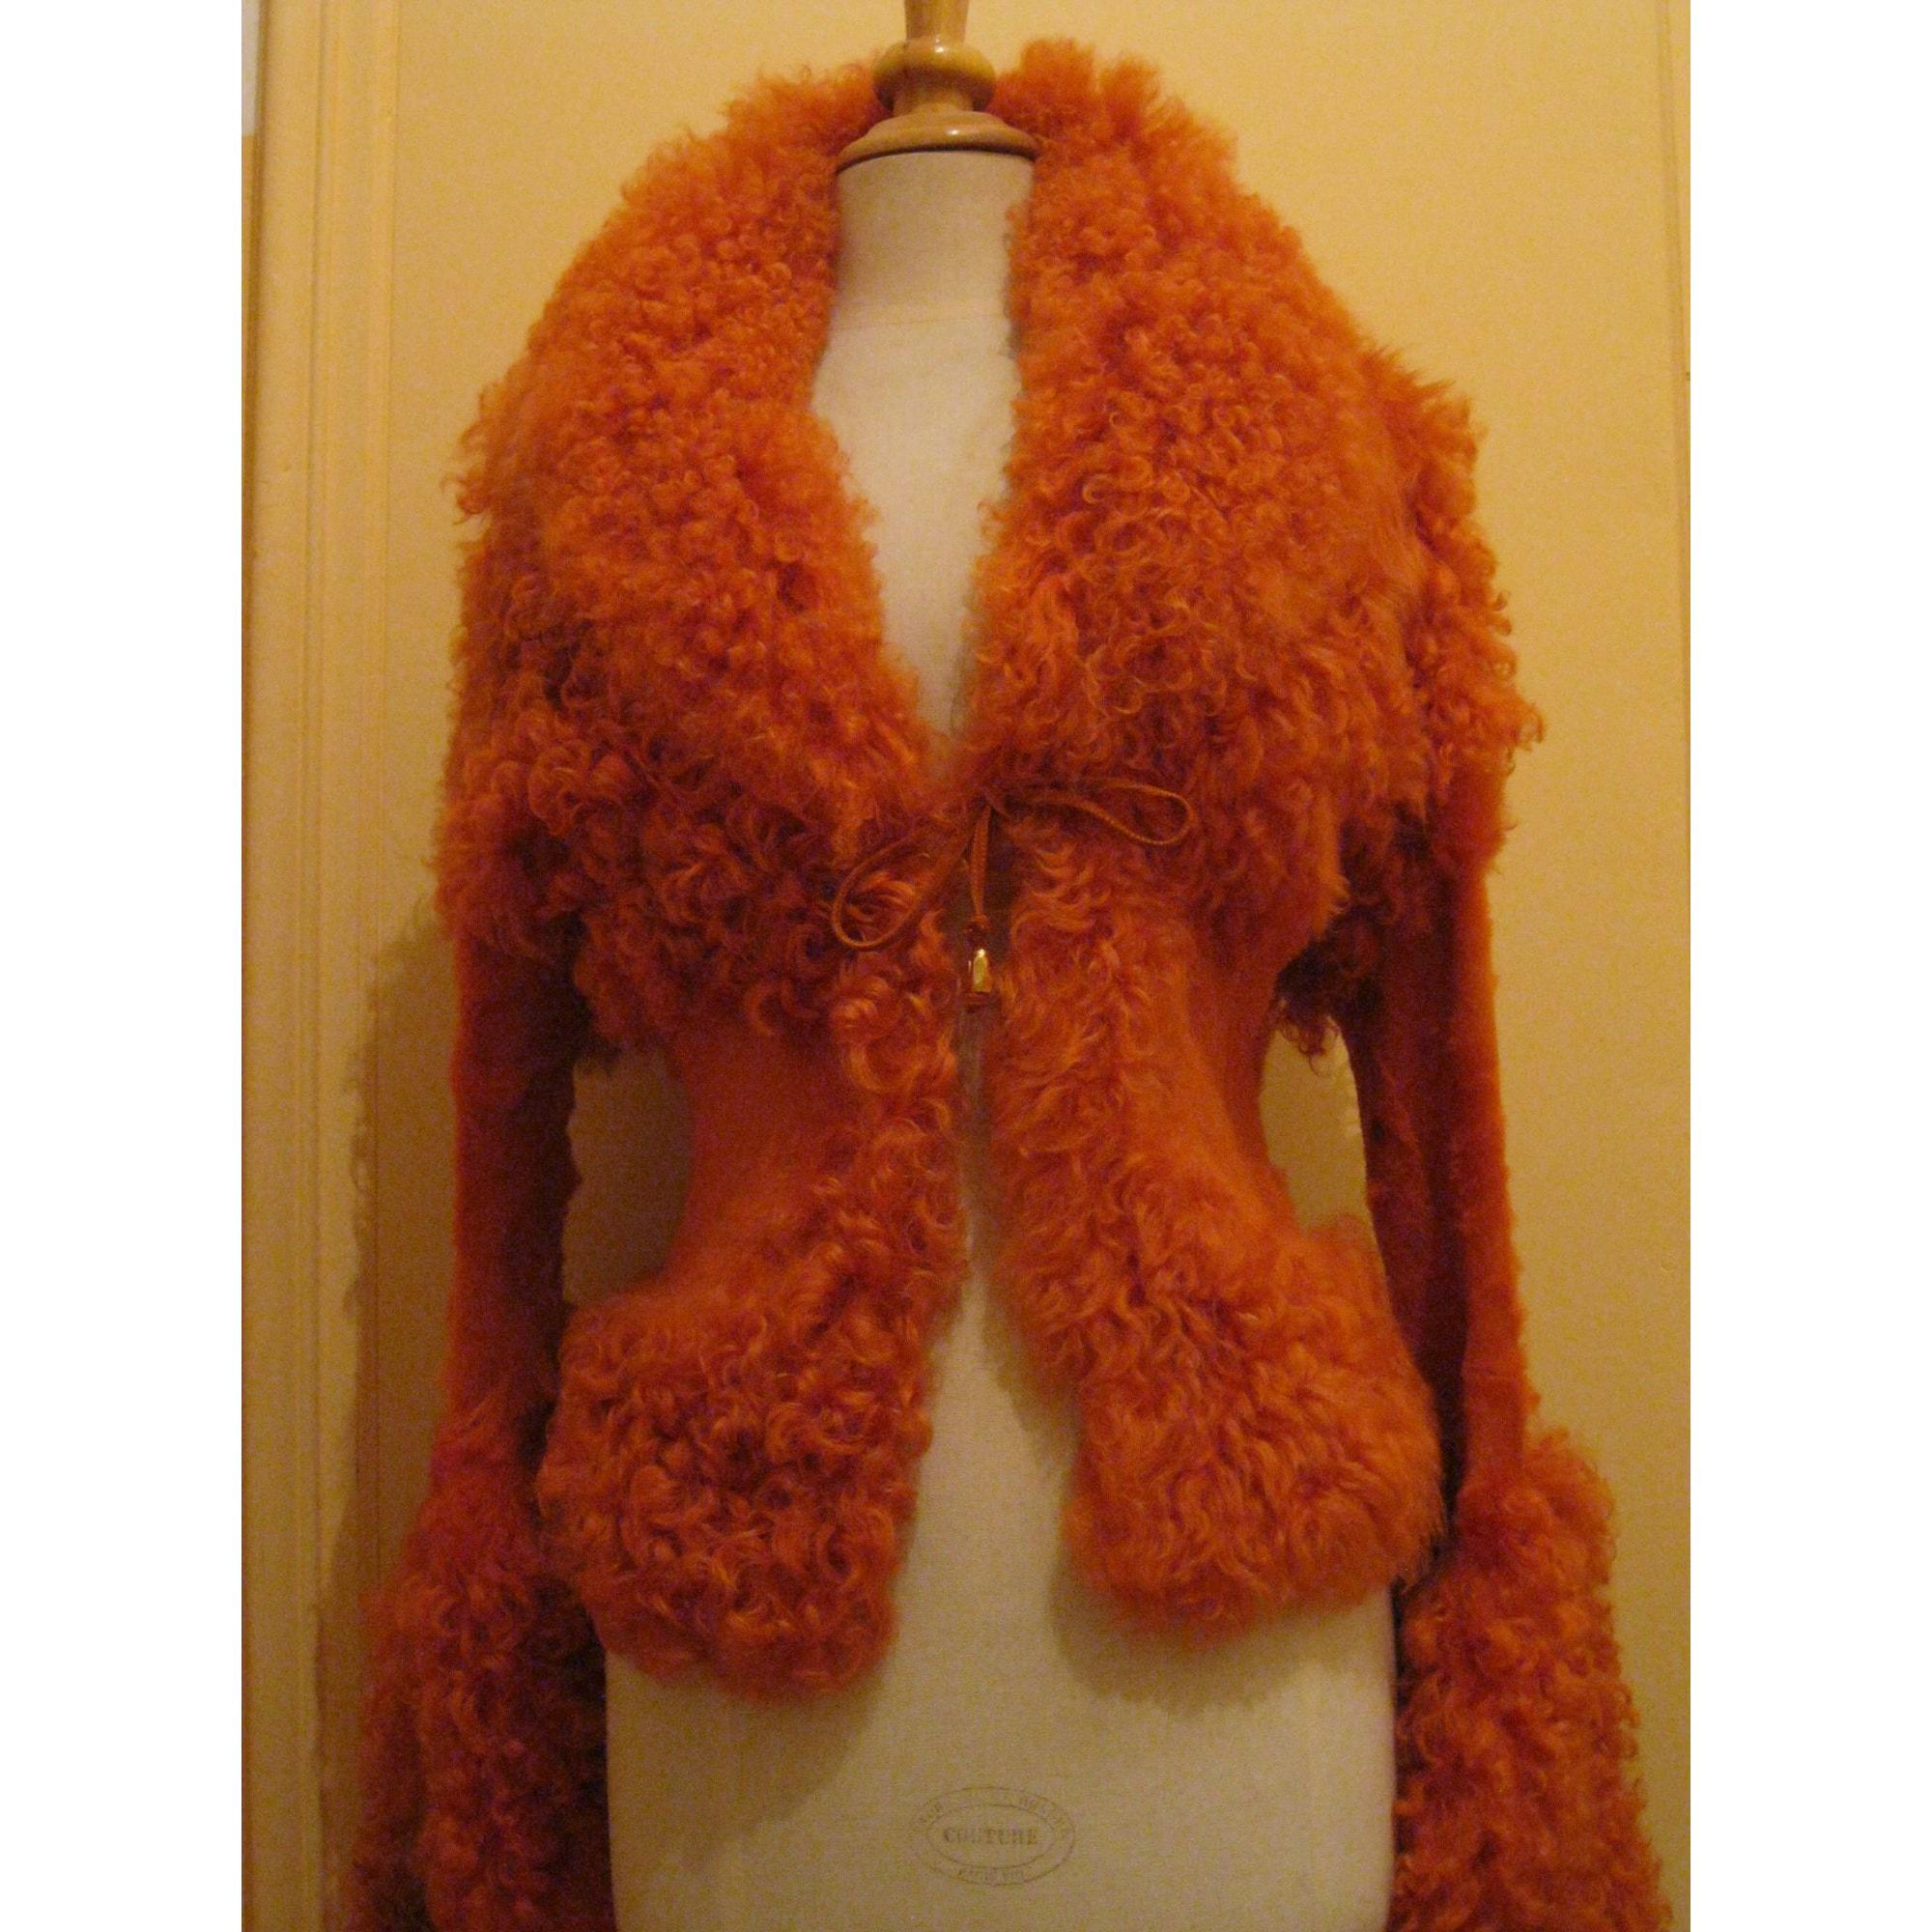 Blouson, veste en fourrure ARTISAN FOURREUR Orange